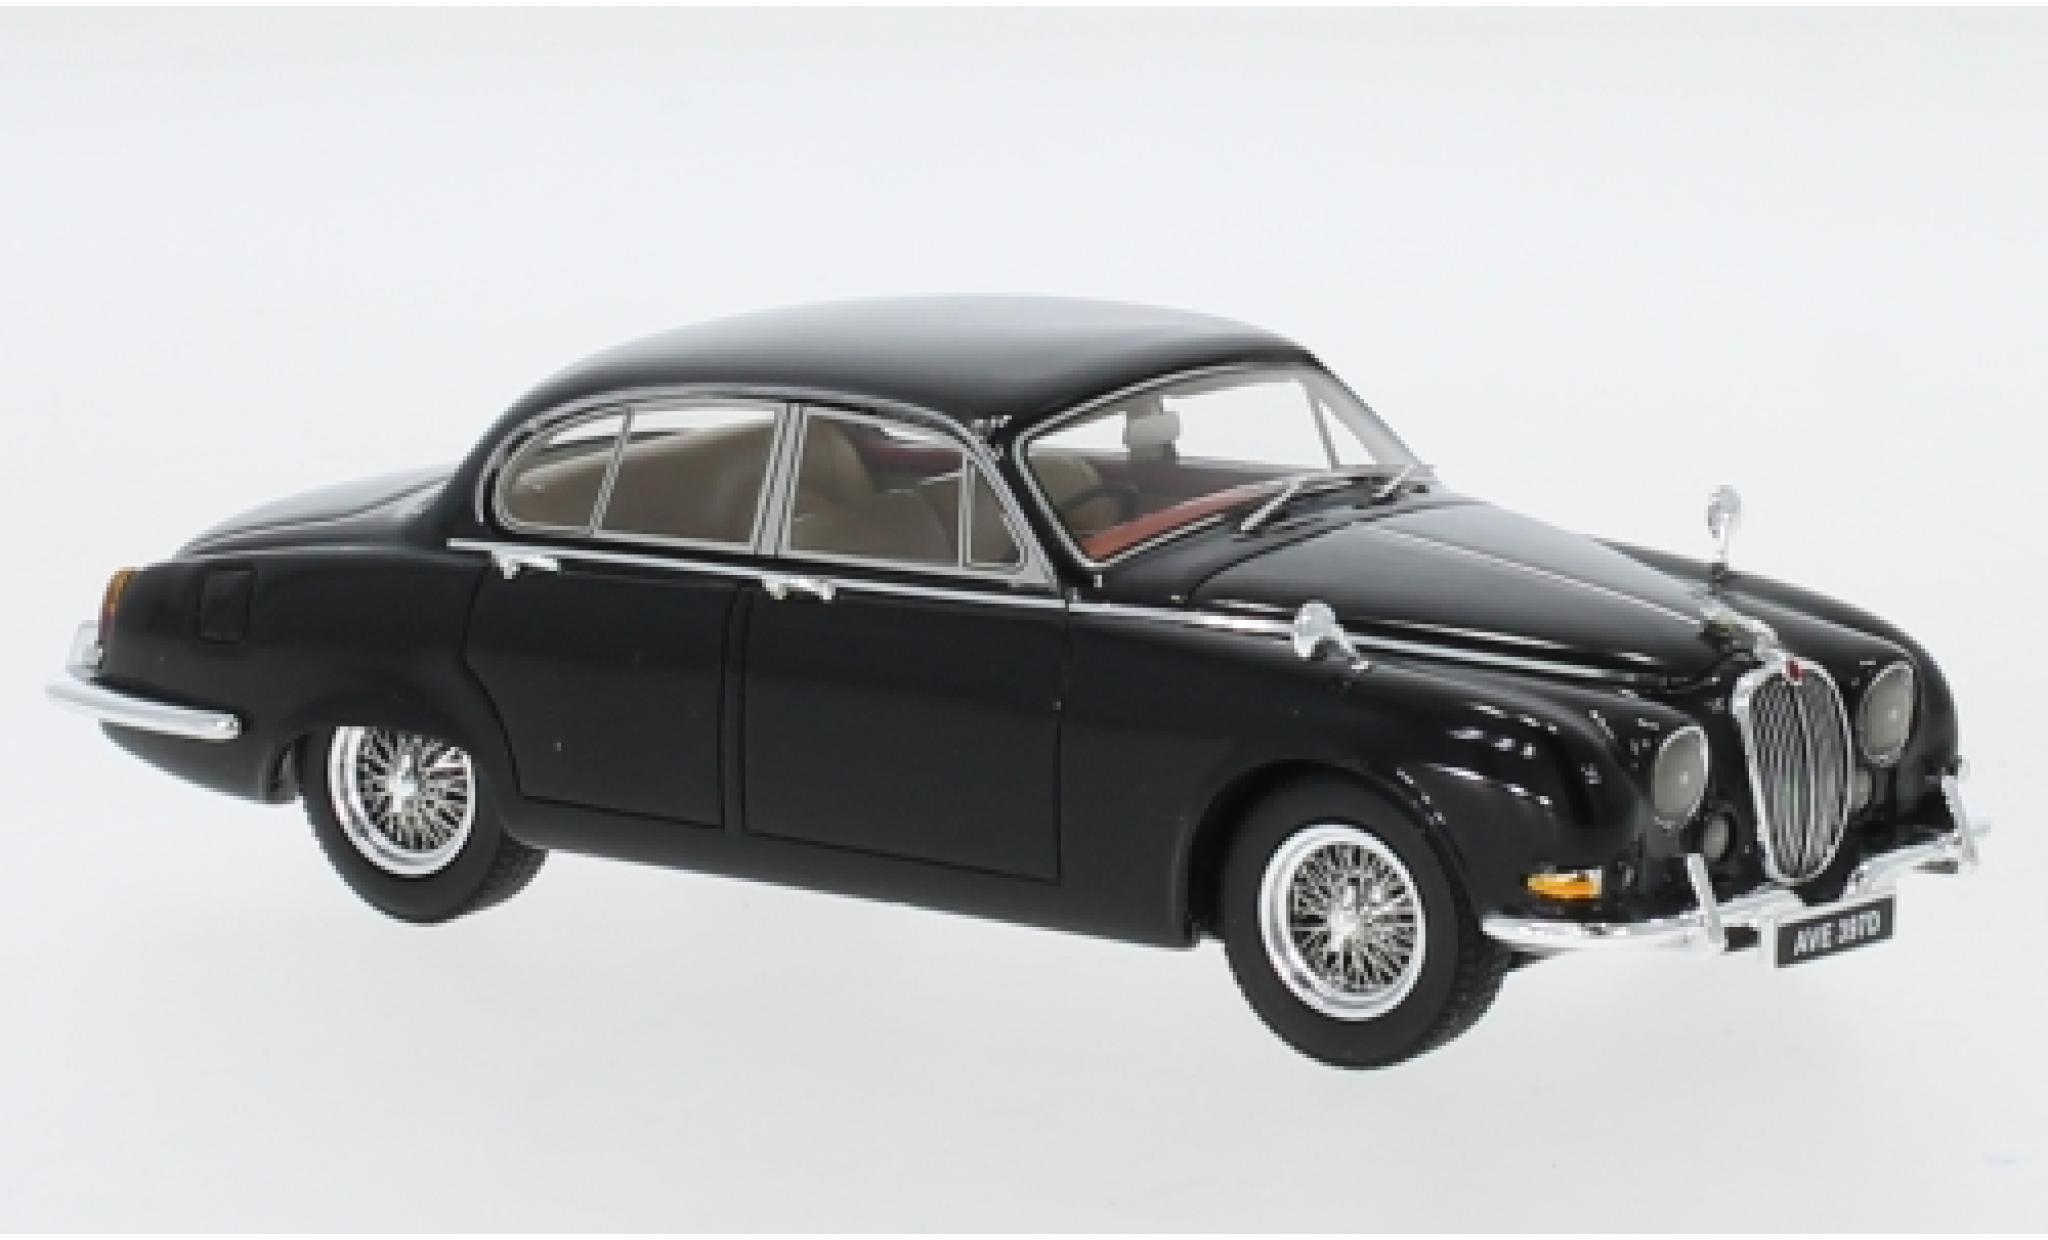 Jaguar S-Type 1/43 Neo 3.4 noire RHD 1965